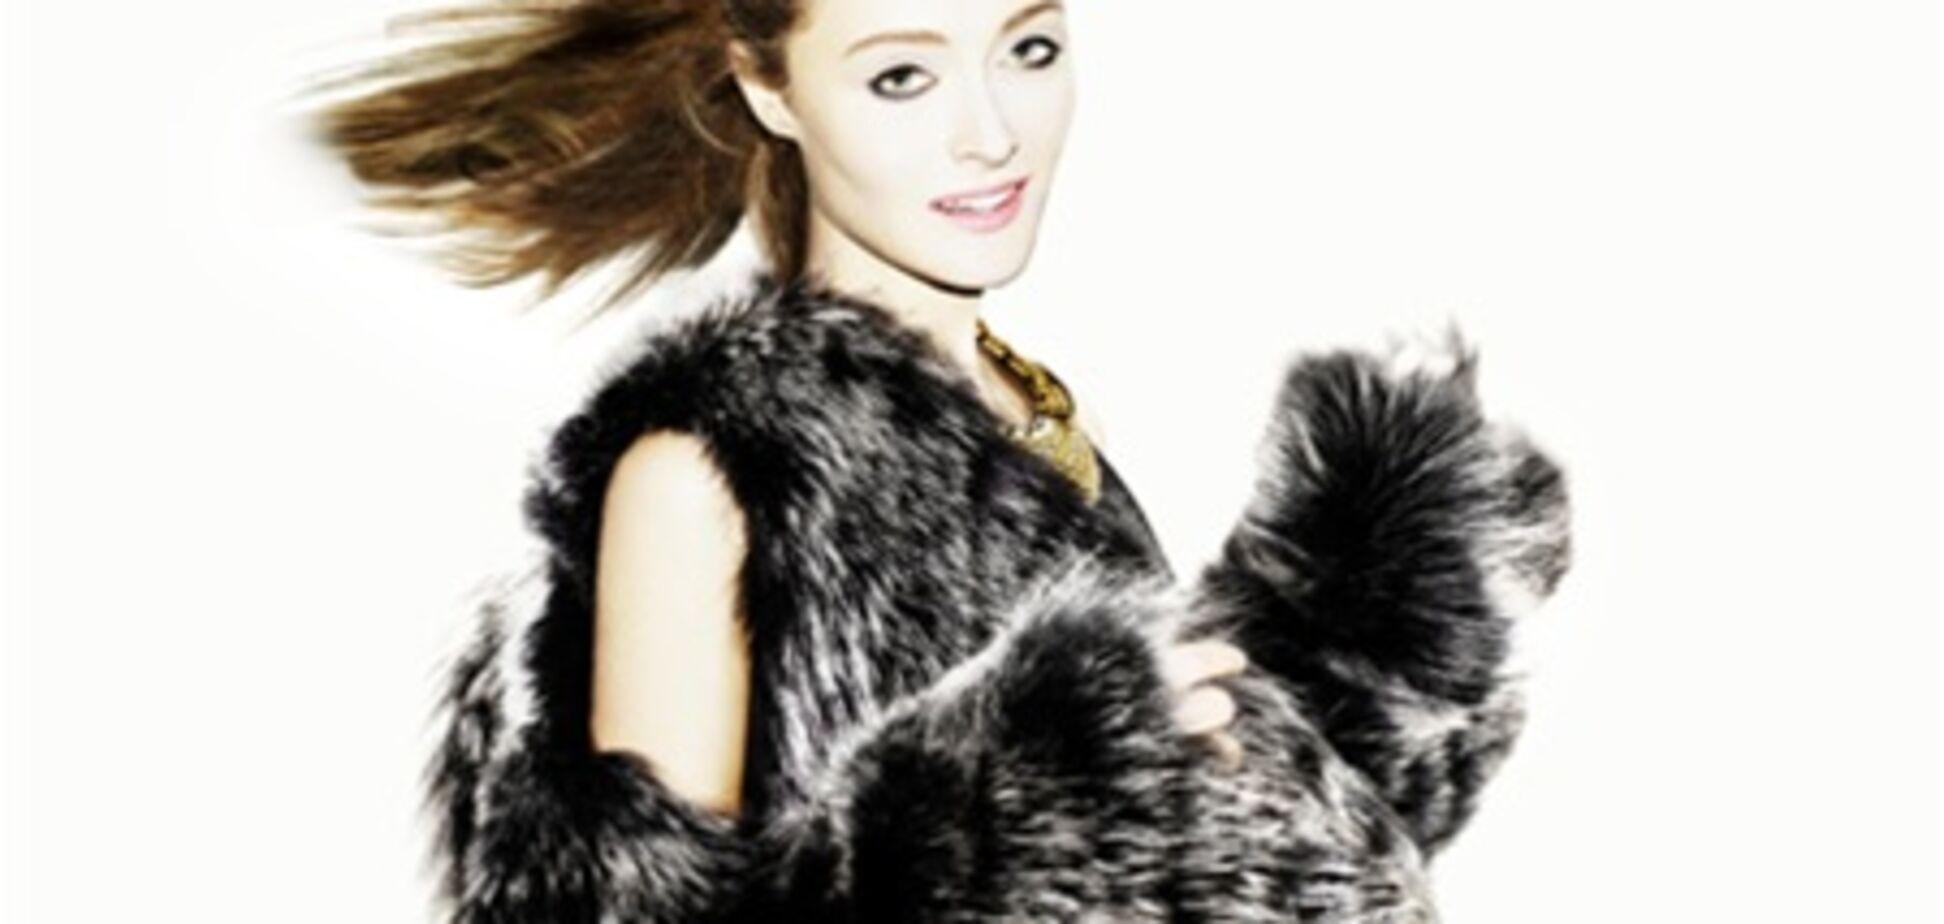 Дарья Шаповалова: Я люблю моду